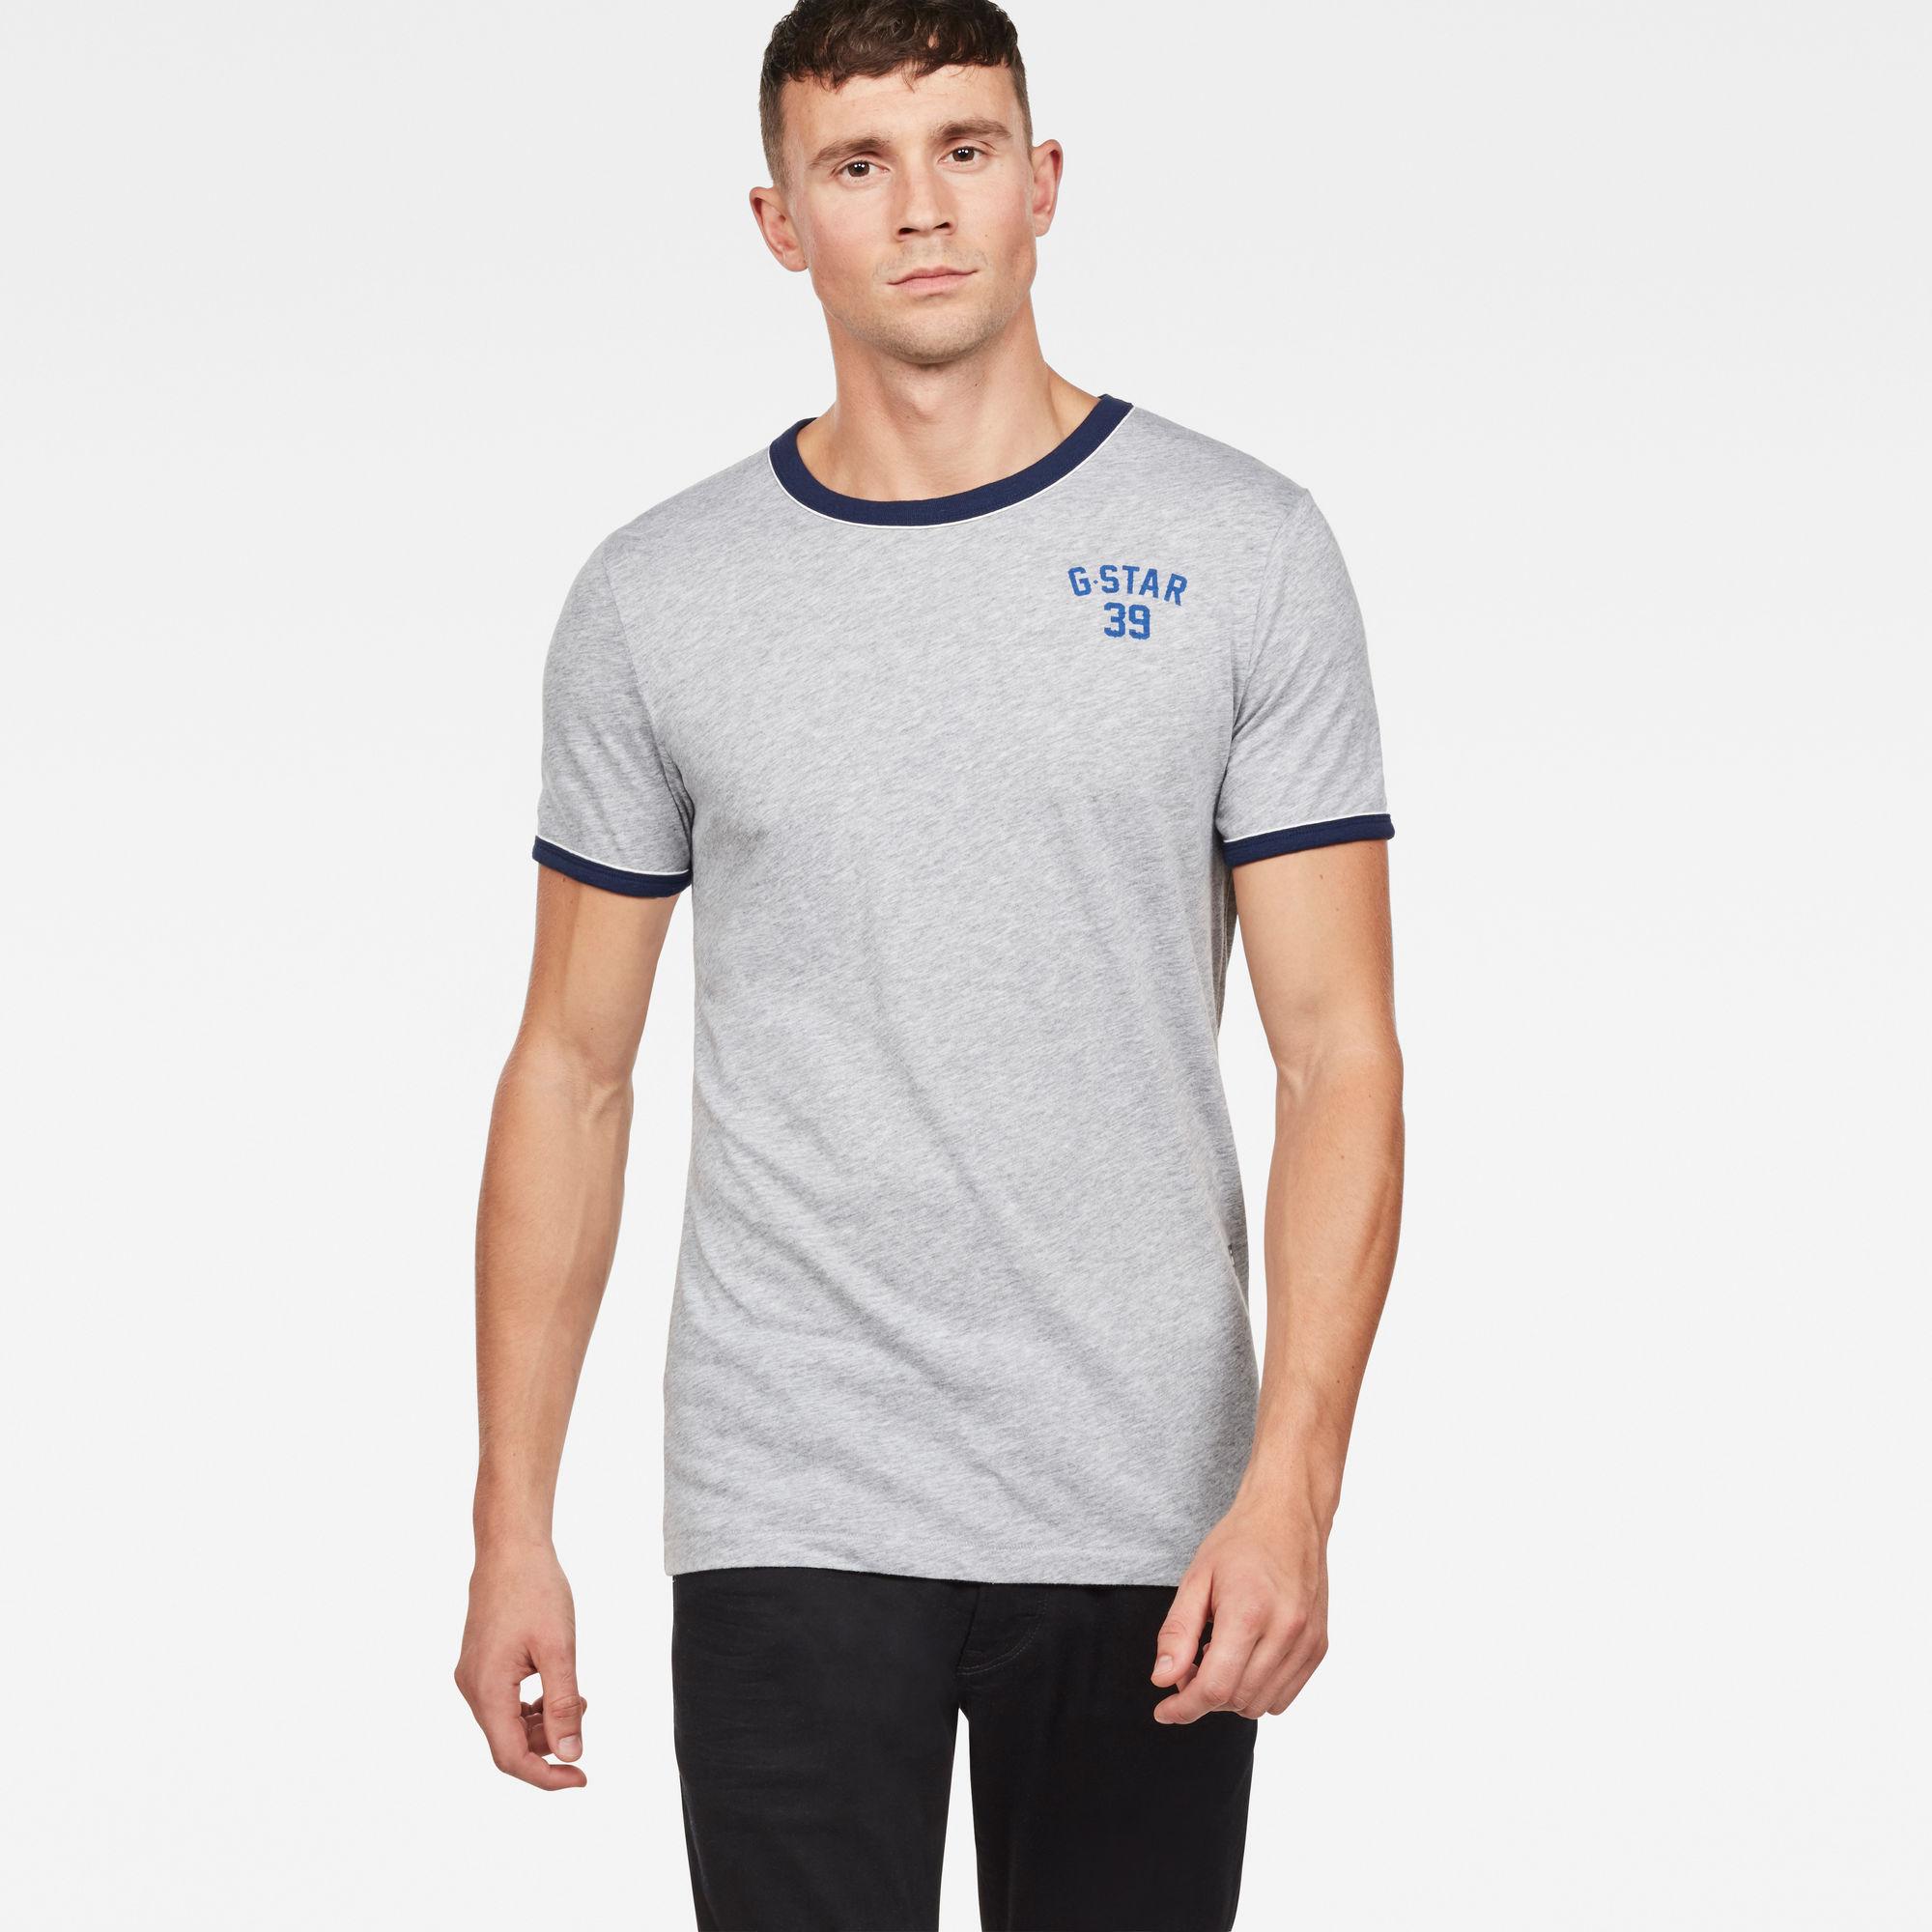 G-Star RAW Heren Polyca Slim T-Shirt Grijs